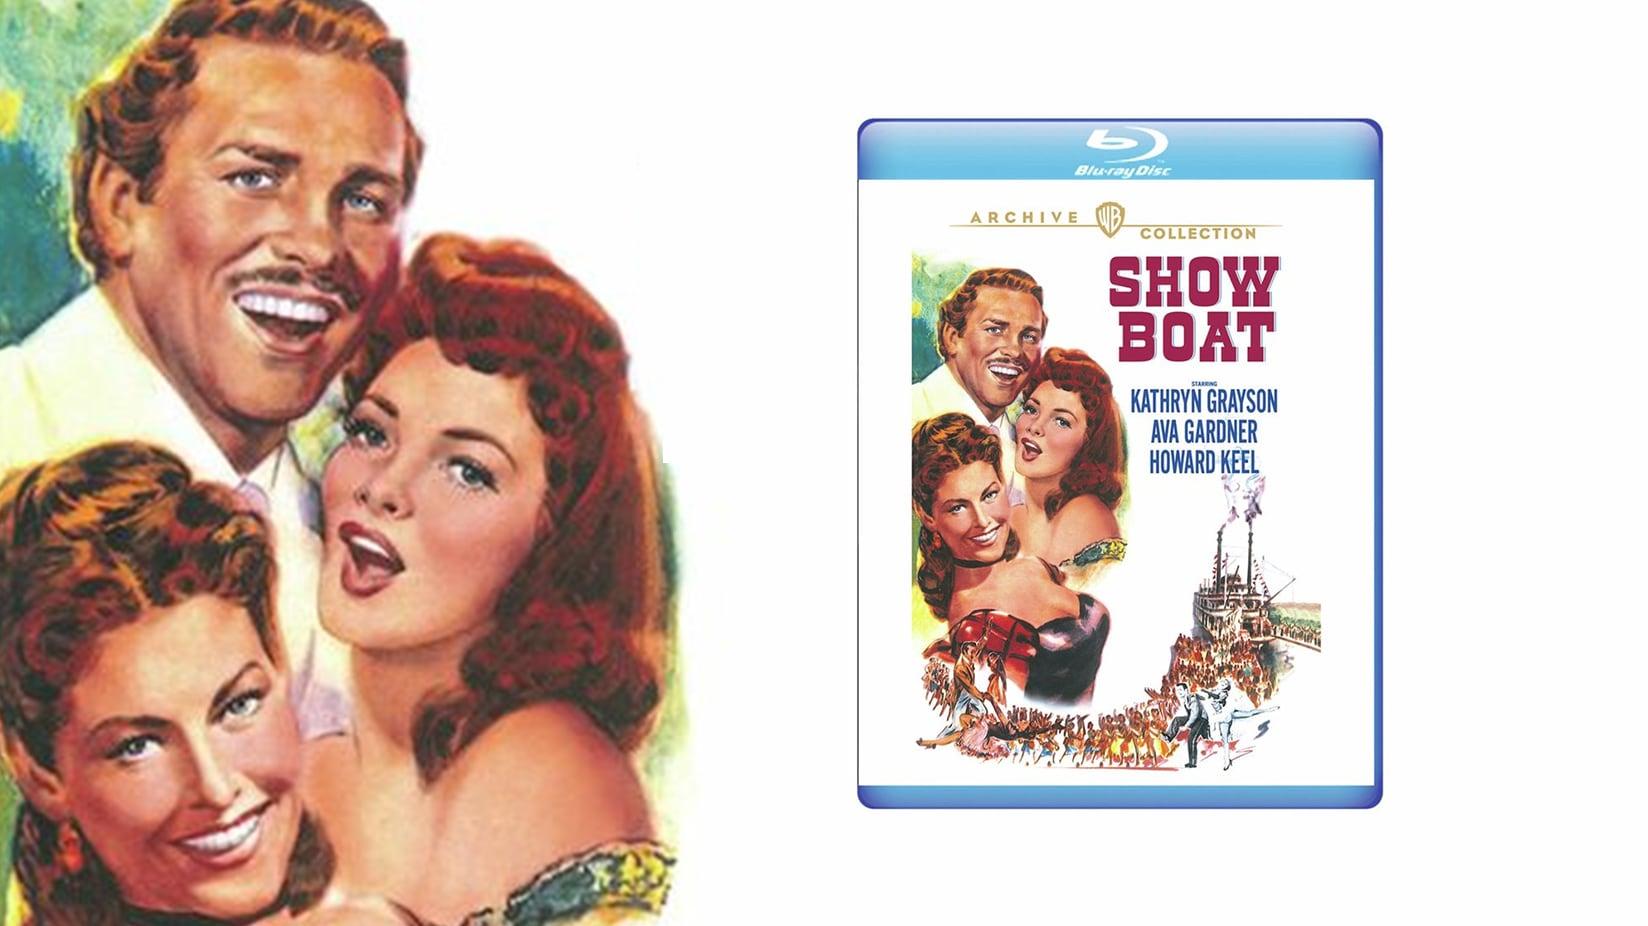 Dick Dinman & George Feltenstein Board M.g.m.'s Show Boat